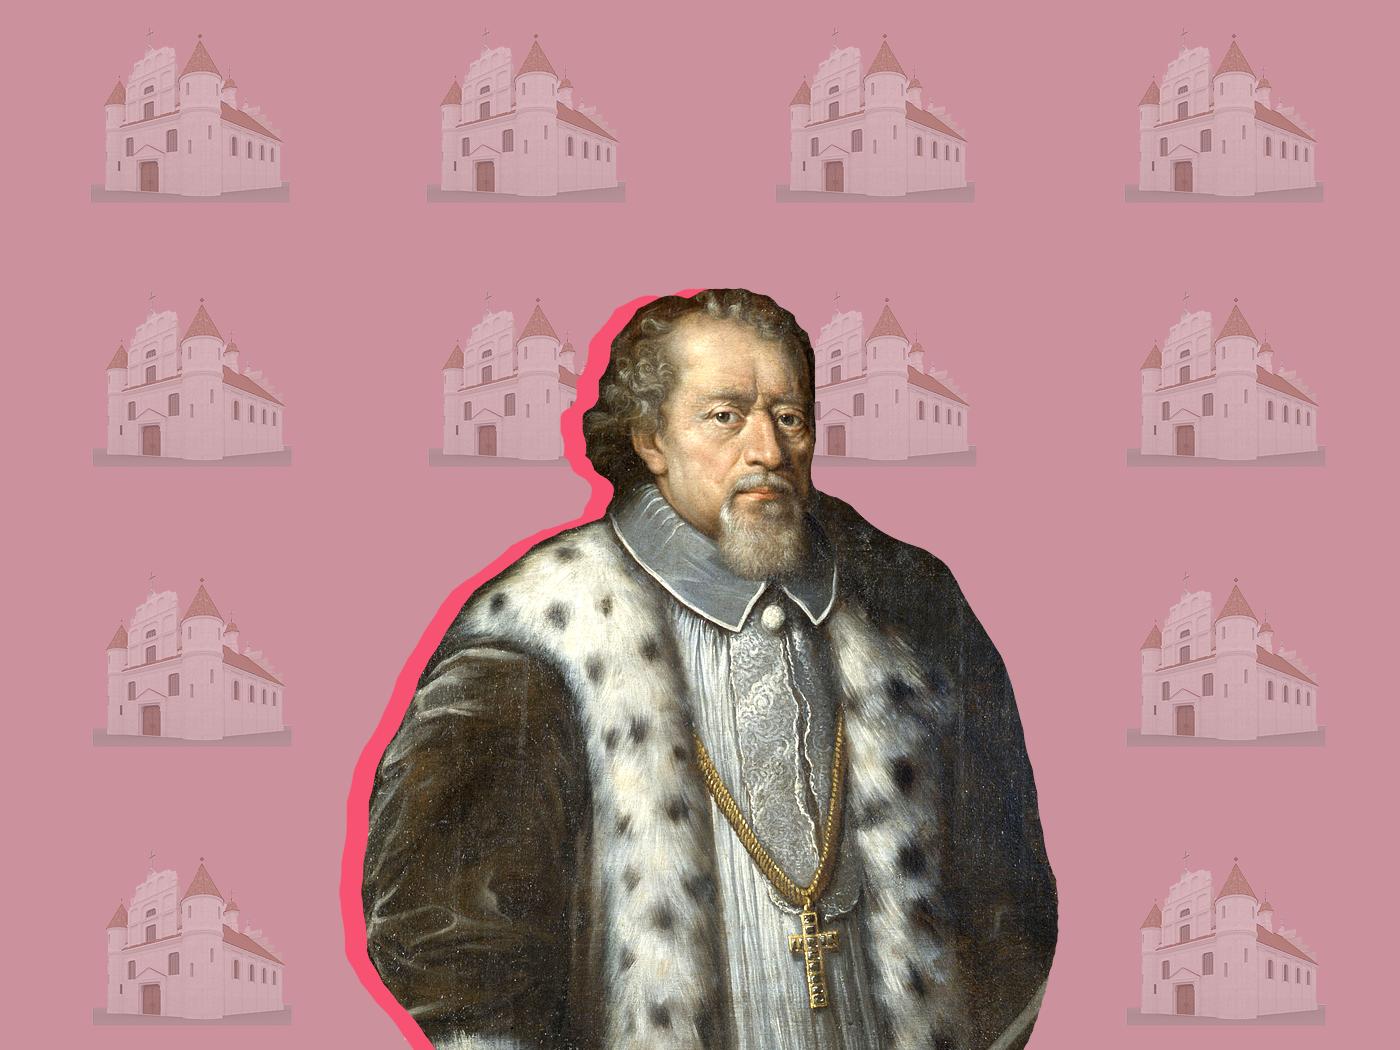 Павло Альґімунт Гольшанський – луцький єпископ